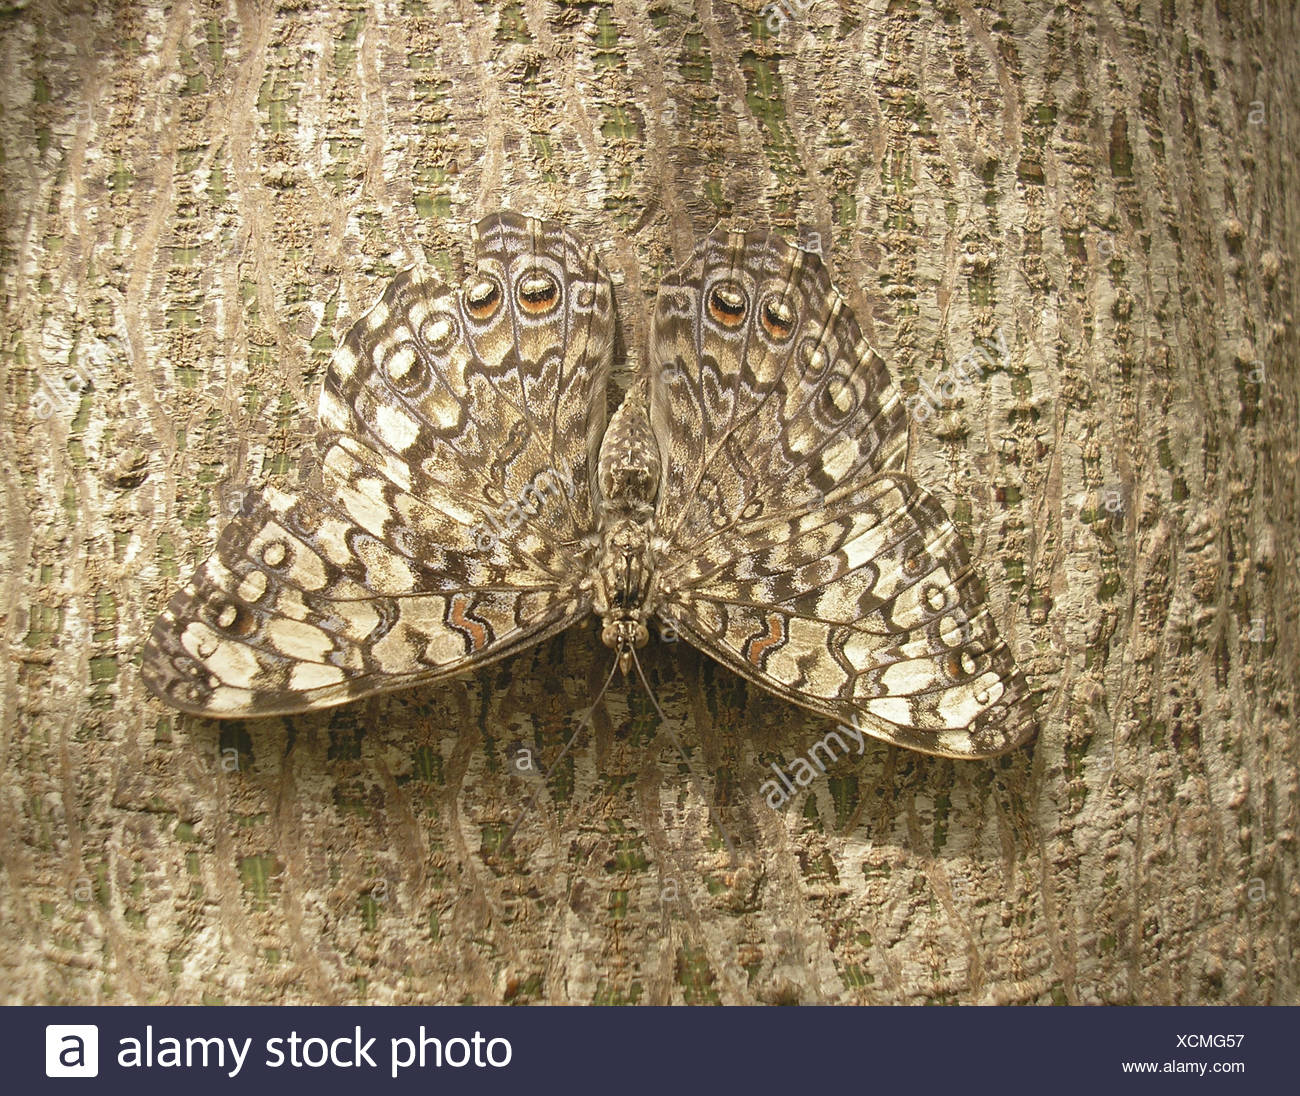 Butterfly Bark Moth Camouflage Adaptation Abandon Go